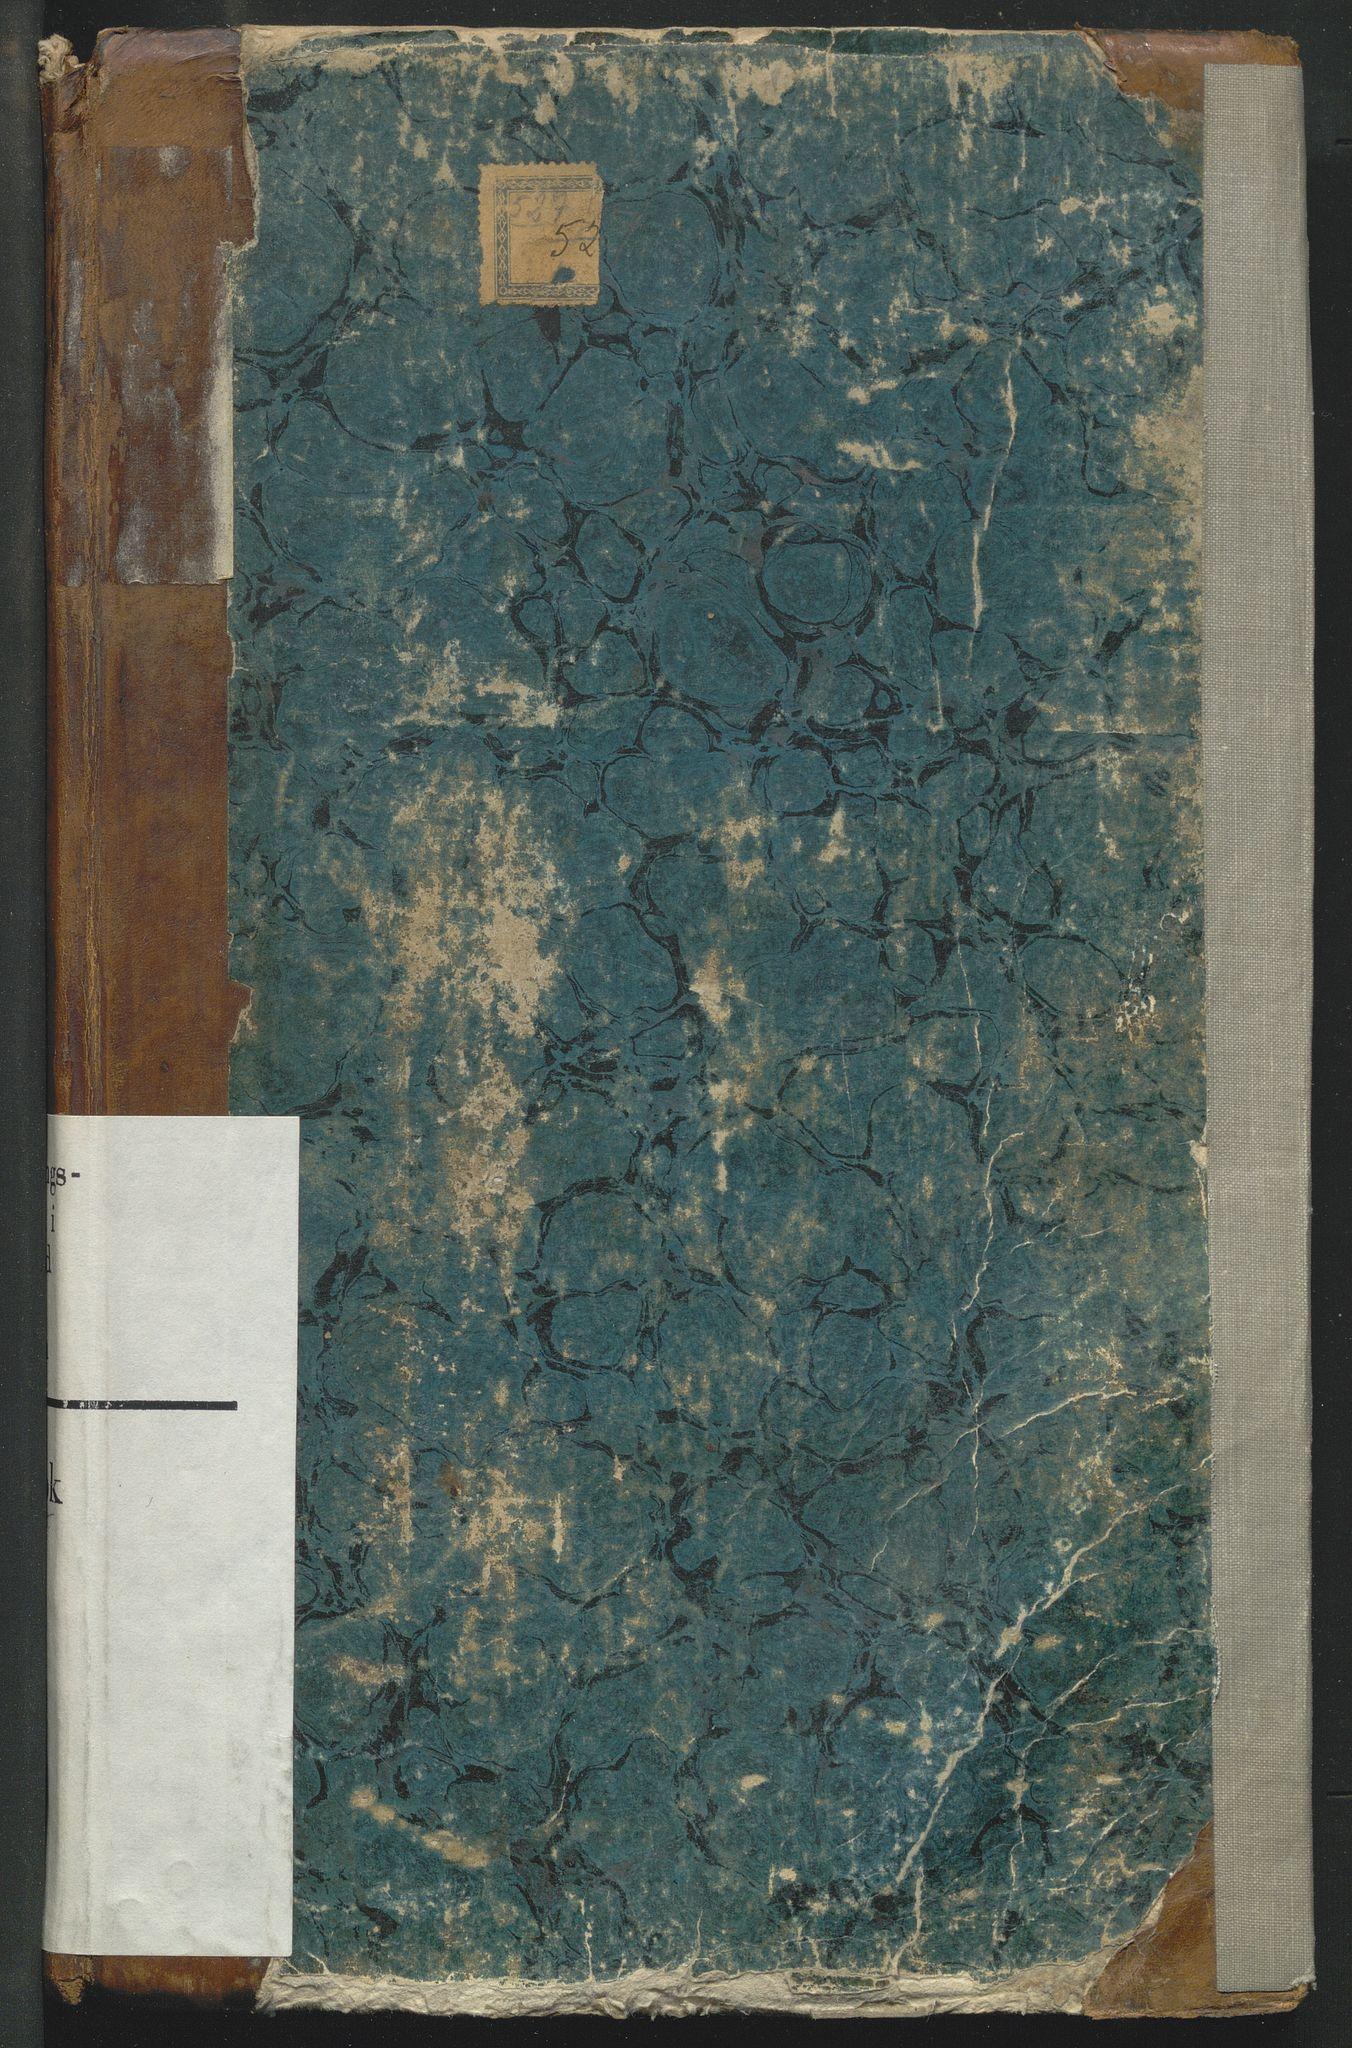 SAH, Utskiftningsformannen i Oppland fylke, H/Hd/Hdg/L0001: Forhandlingsprotokoller, 1859-1866